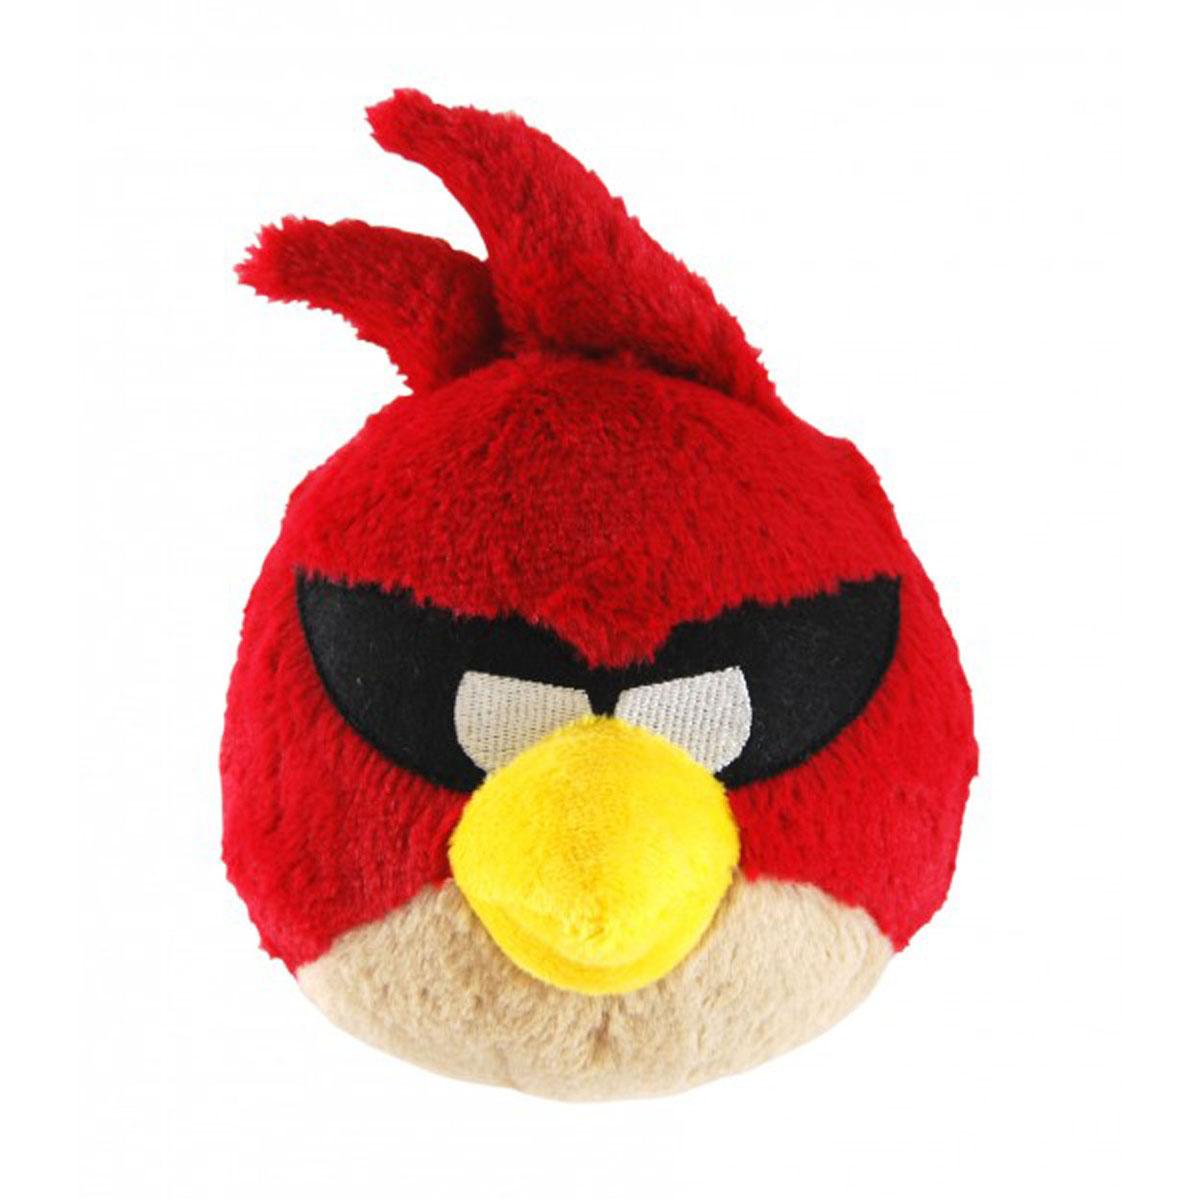 Мягкая игрушка Angry Birds Space, красная птица, со звуком, 40 см картридж samsung mlt d111s для sl m2020 2022 2070 1000стр